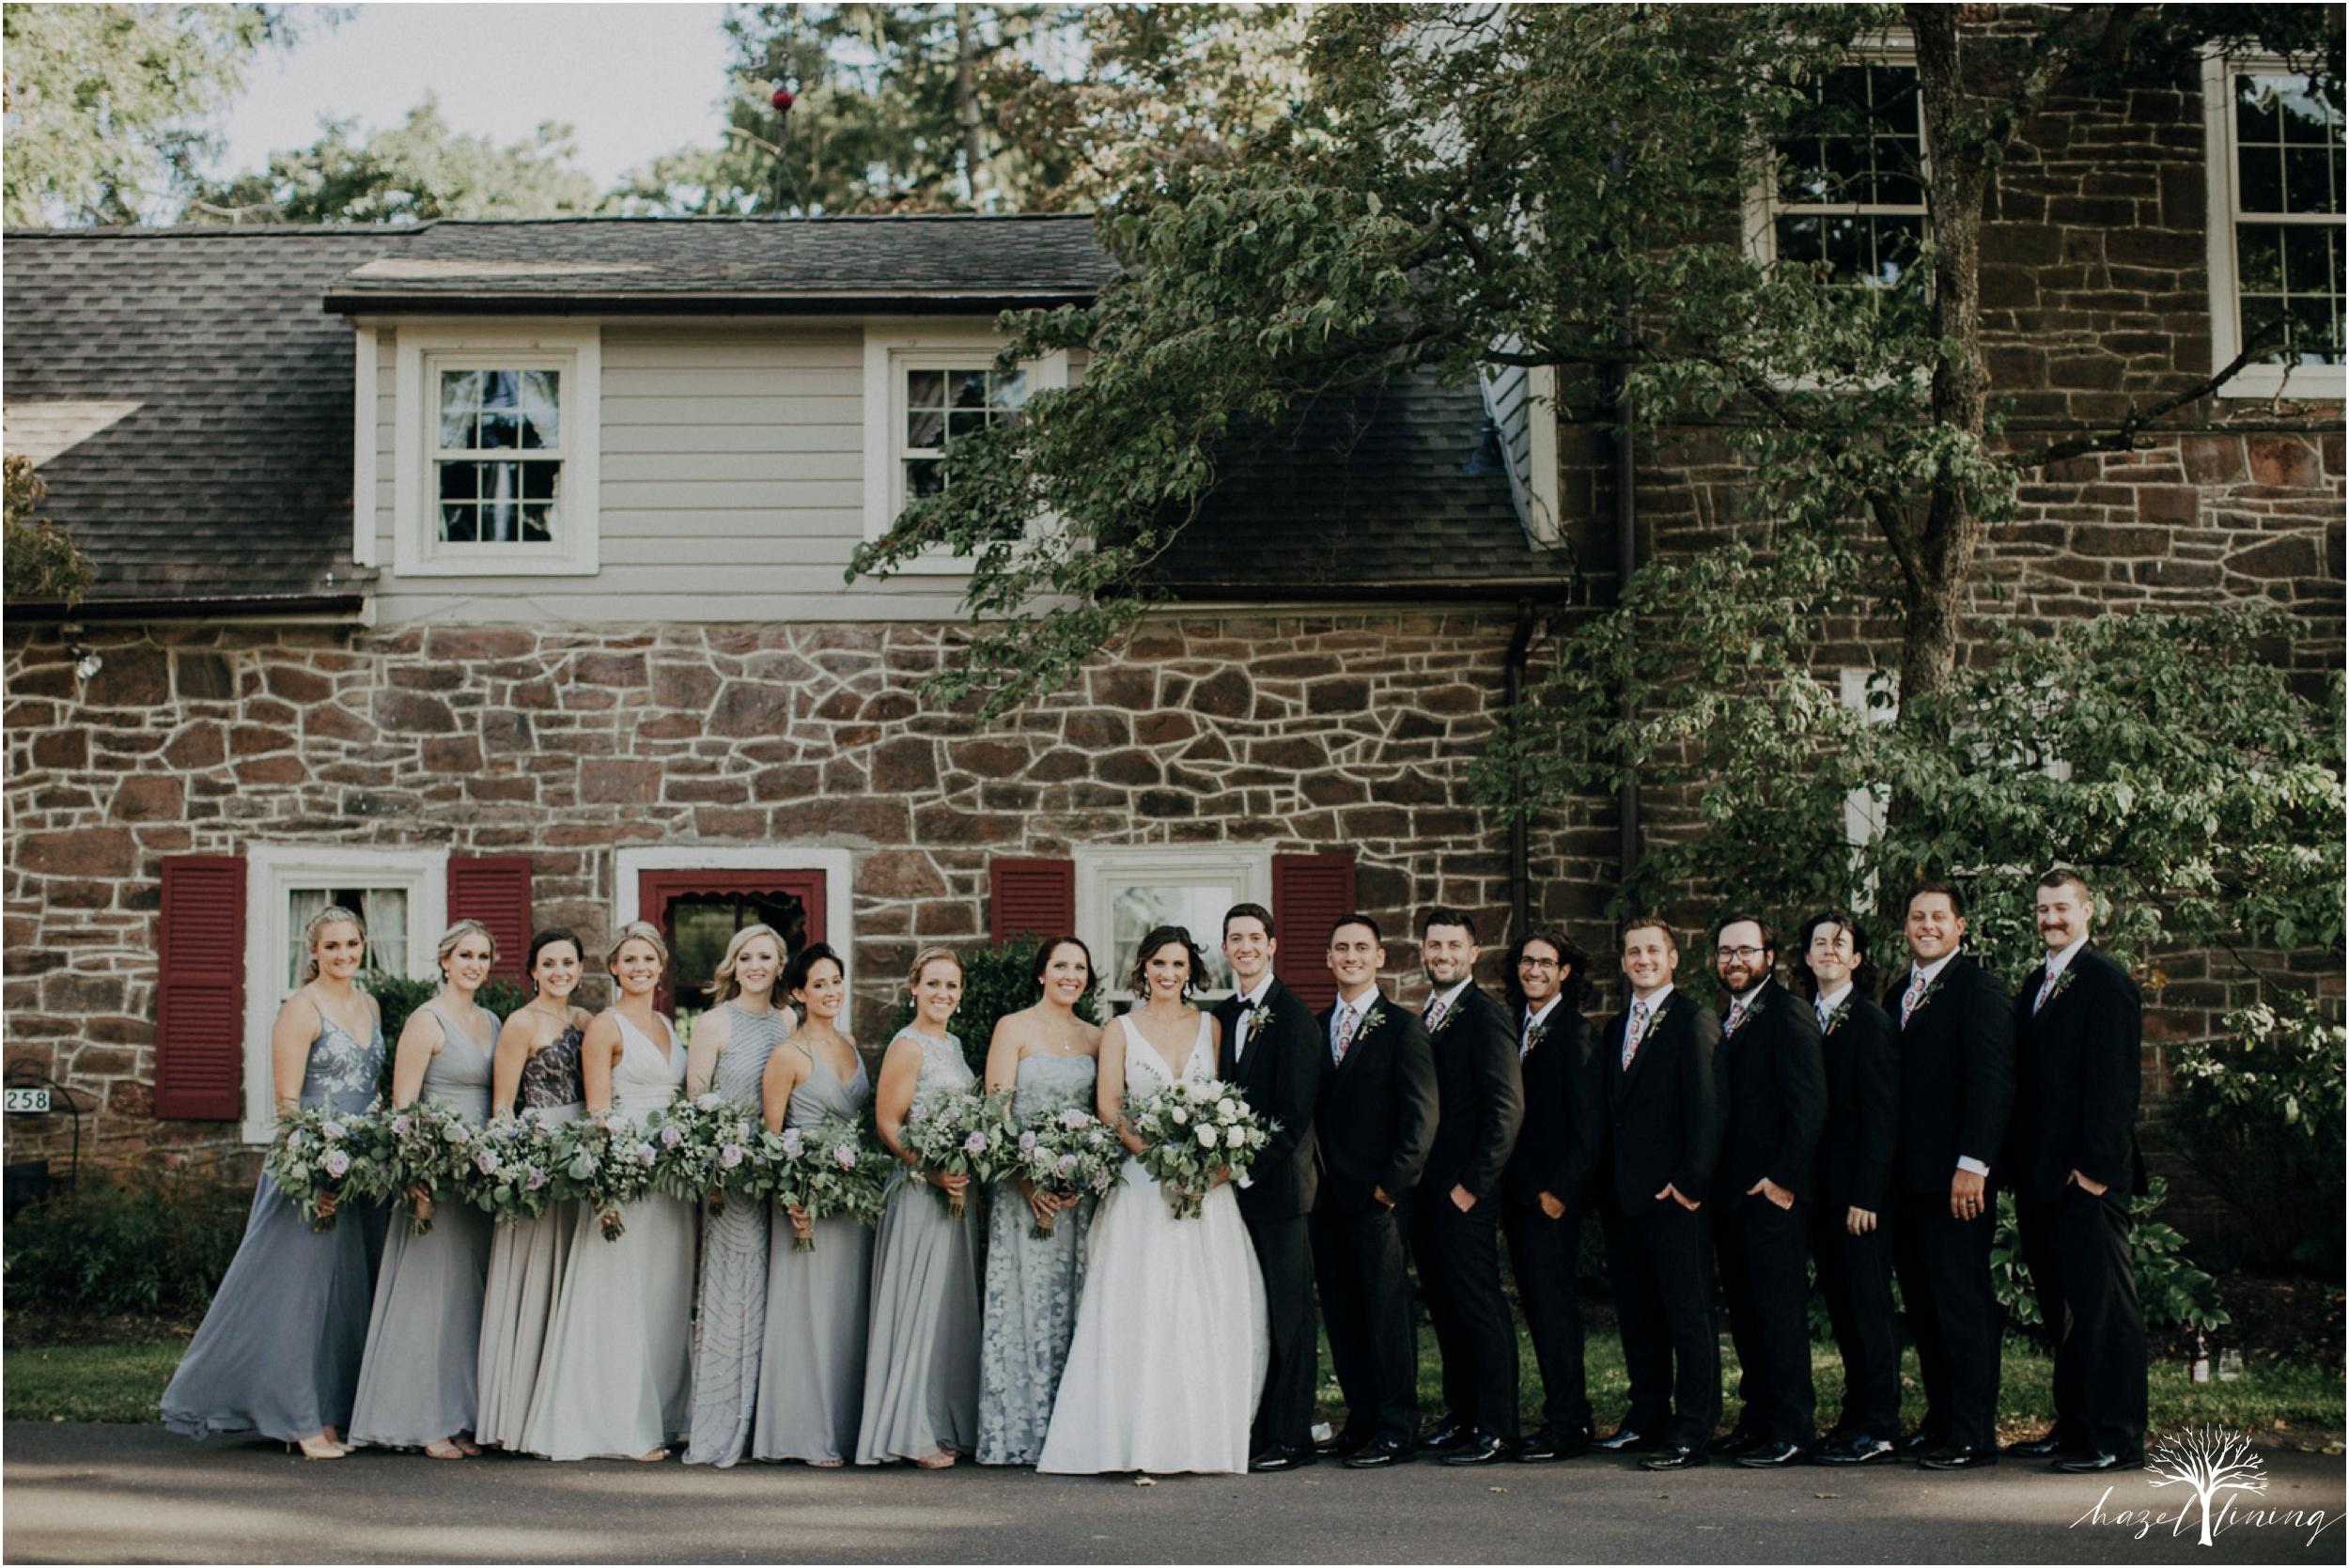 maureen-hepner-anthony-giordano-rose-bank-winery-newtow-pennsylvania-luxury-summer-wedding-hazel-lining-photography-destination-elopement-wedding-engagement-photography_0082.jpg